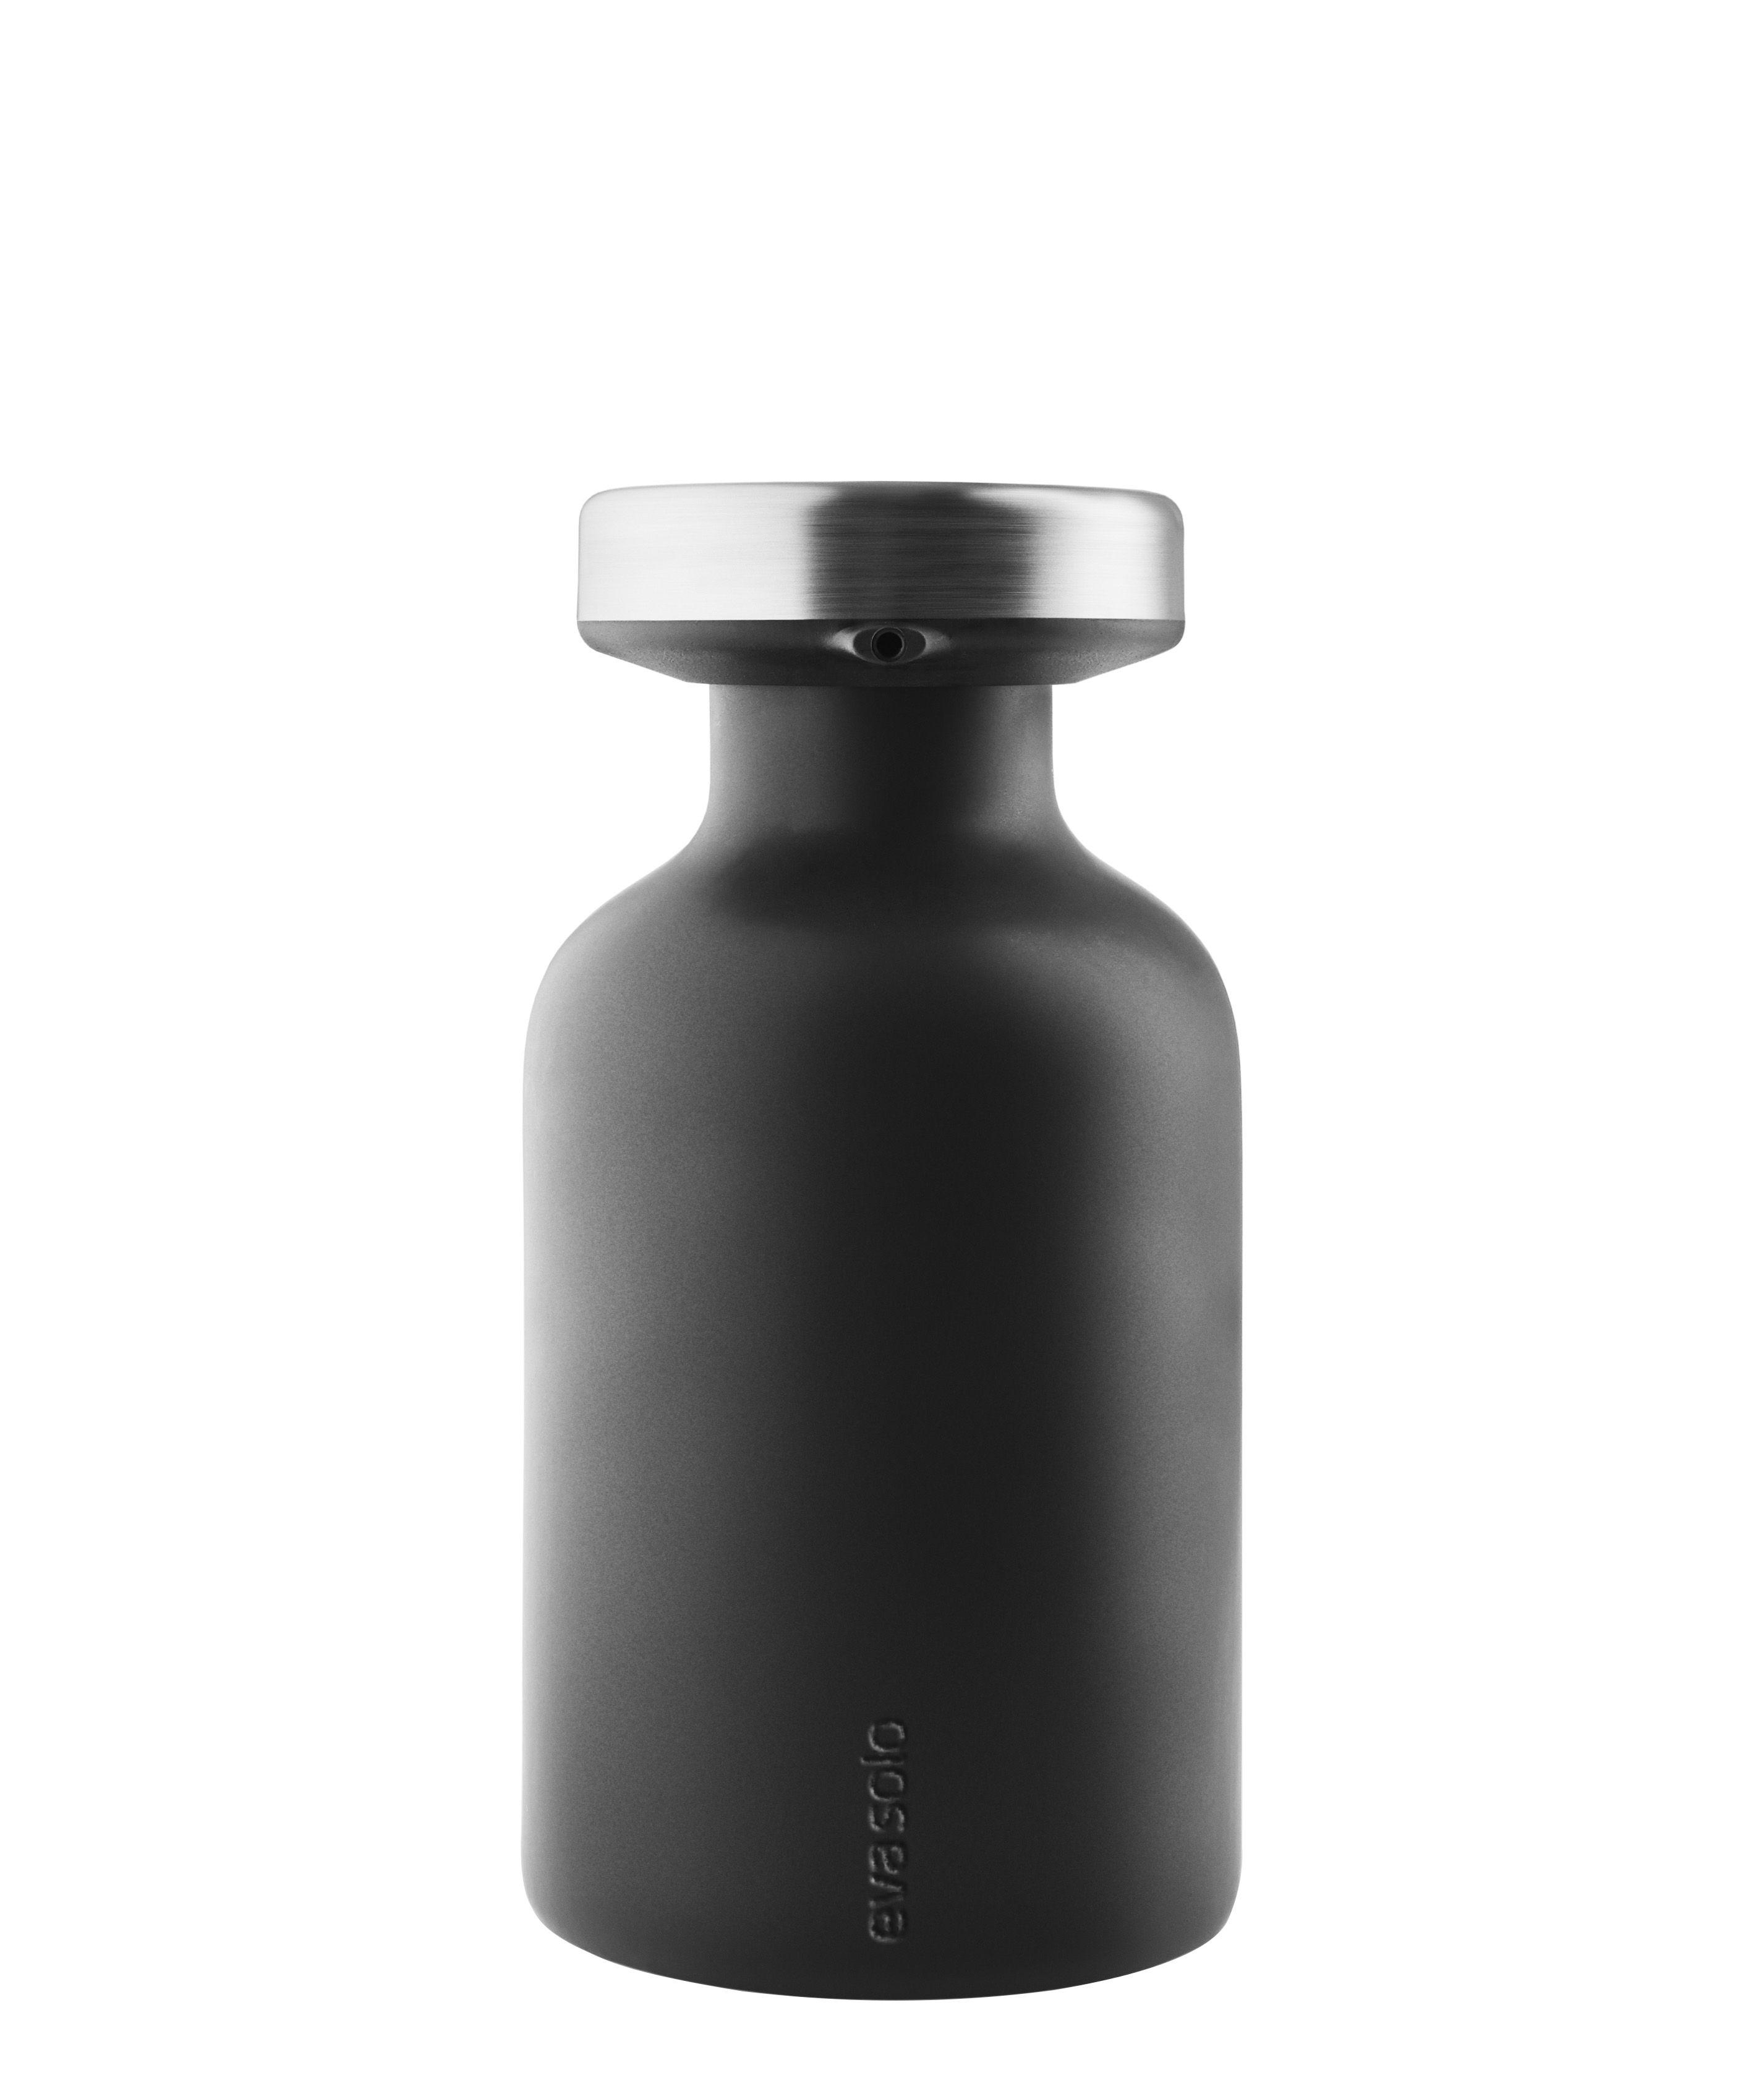 Accessories - Bathroom Accessories - Soap dispenser - / With lid by Eva Solo - Matt black - Ceramic, Stainless steel